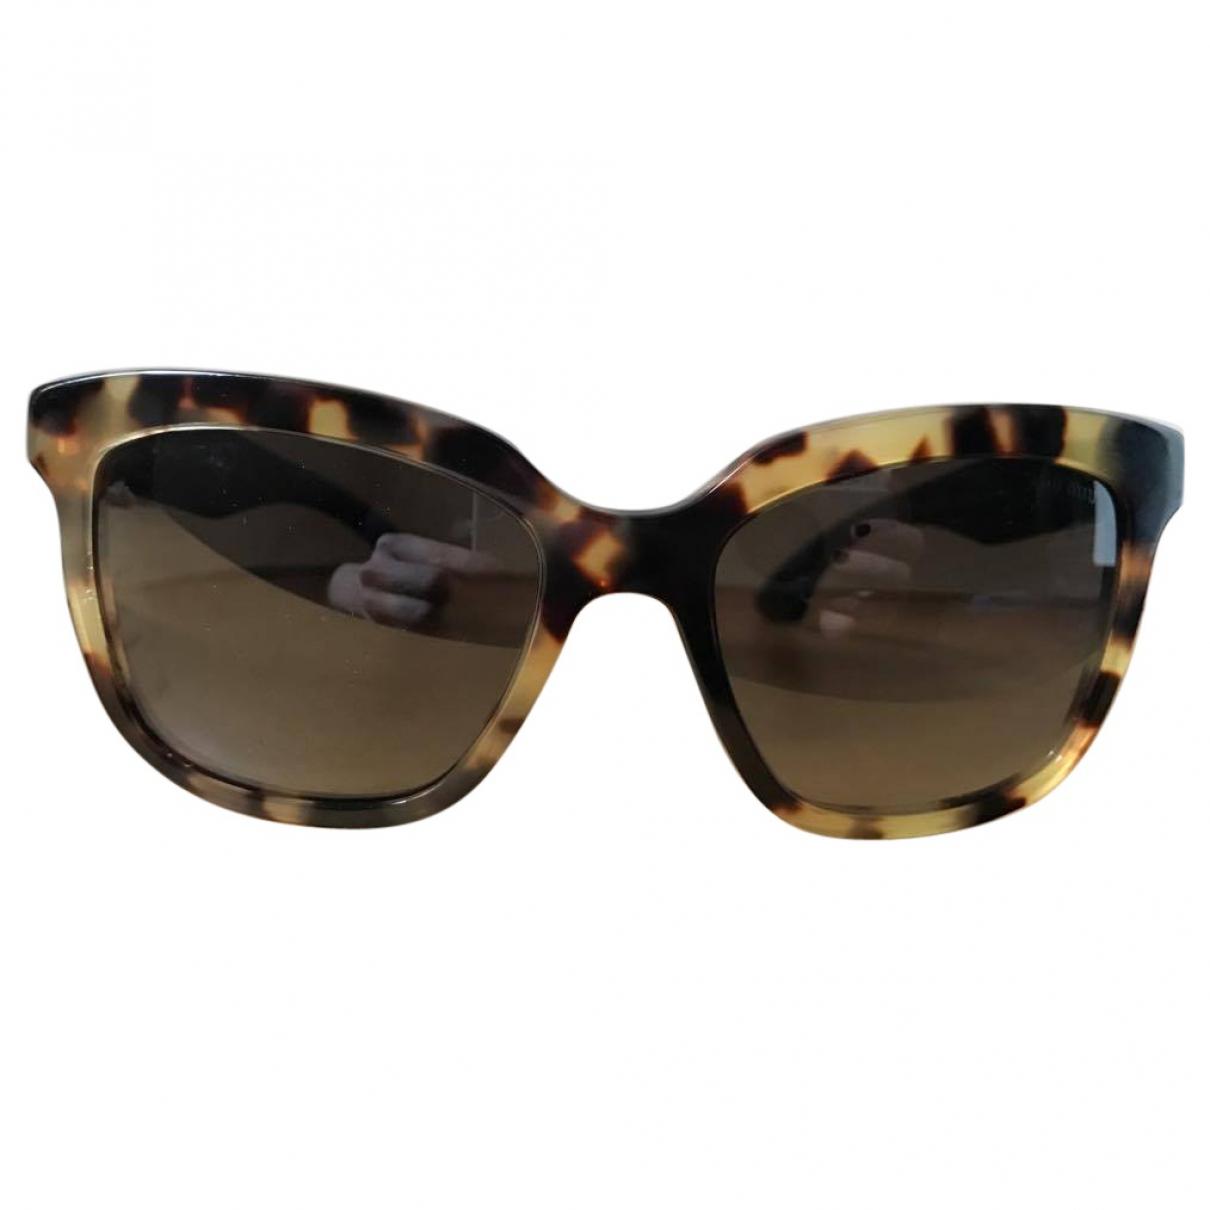 Miu Miu \N Sonnenbrillen in  Braun Kunststoff